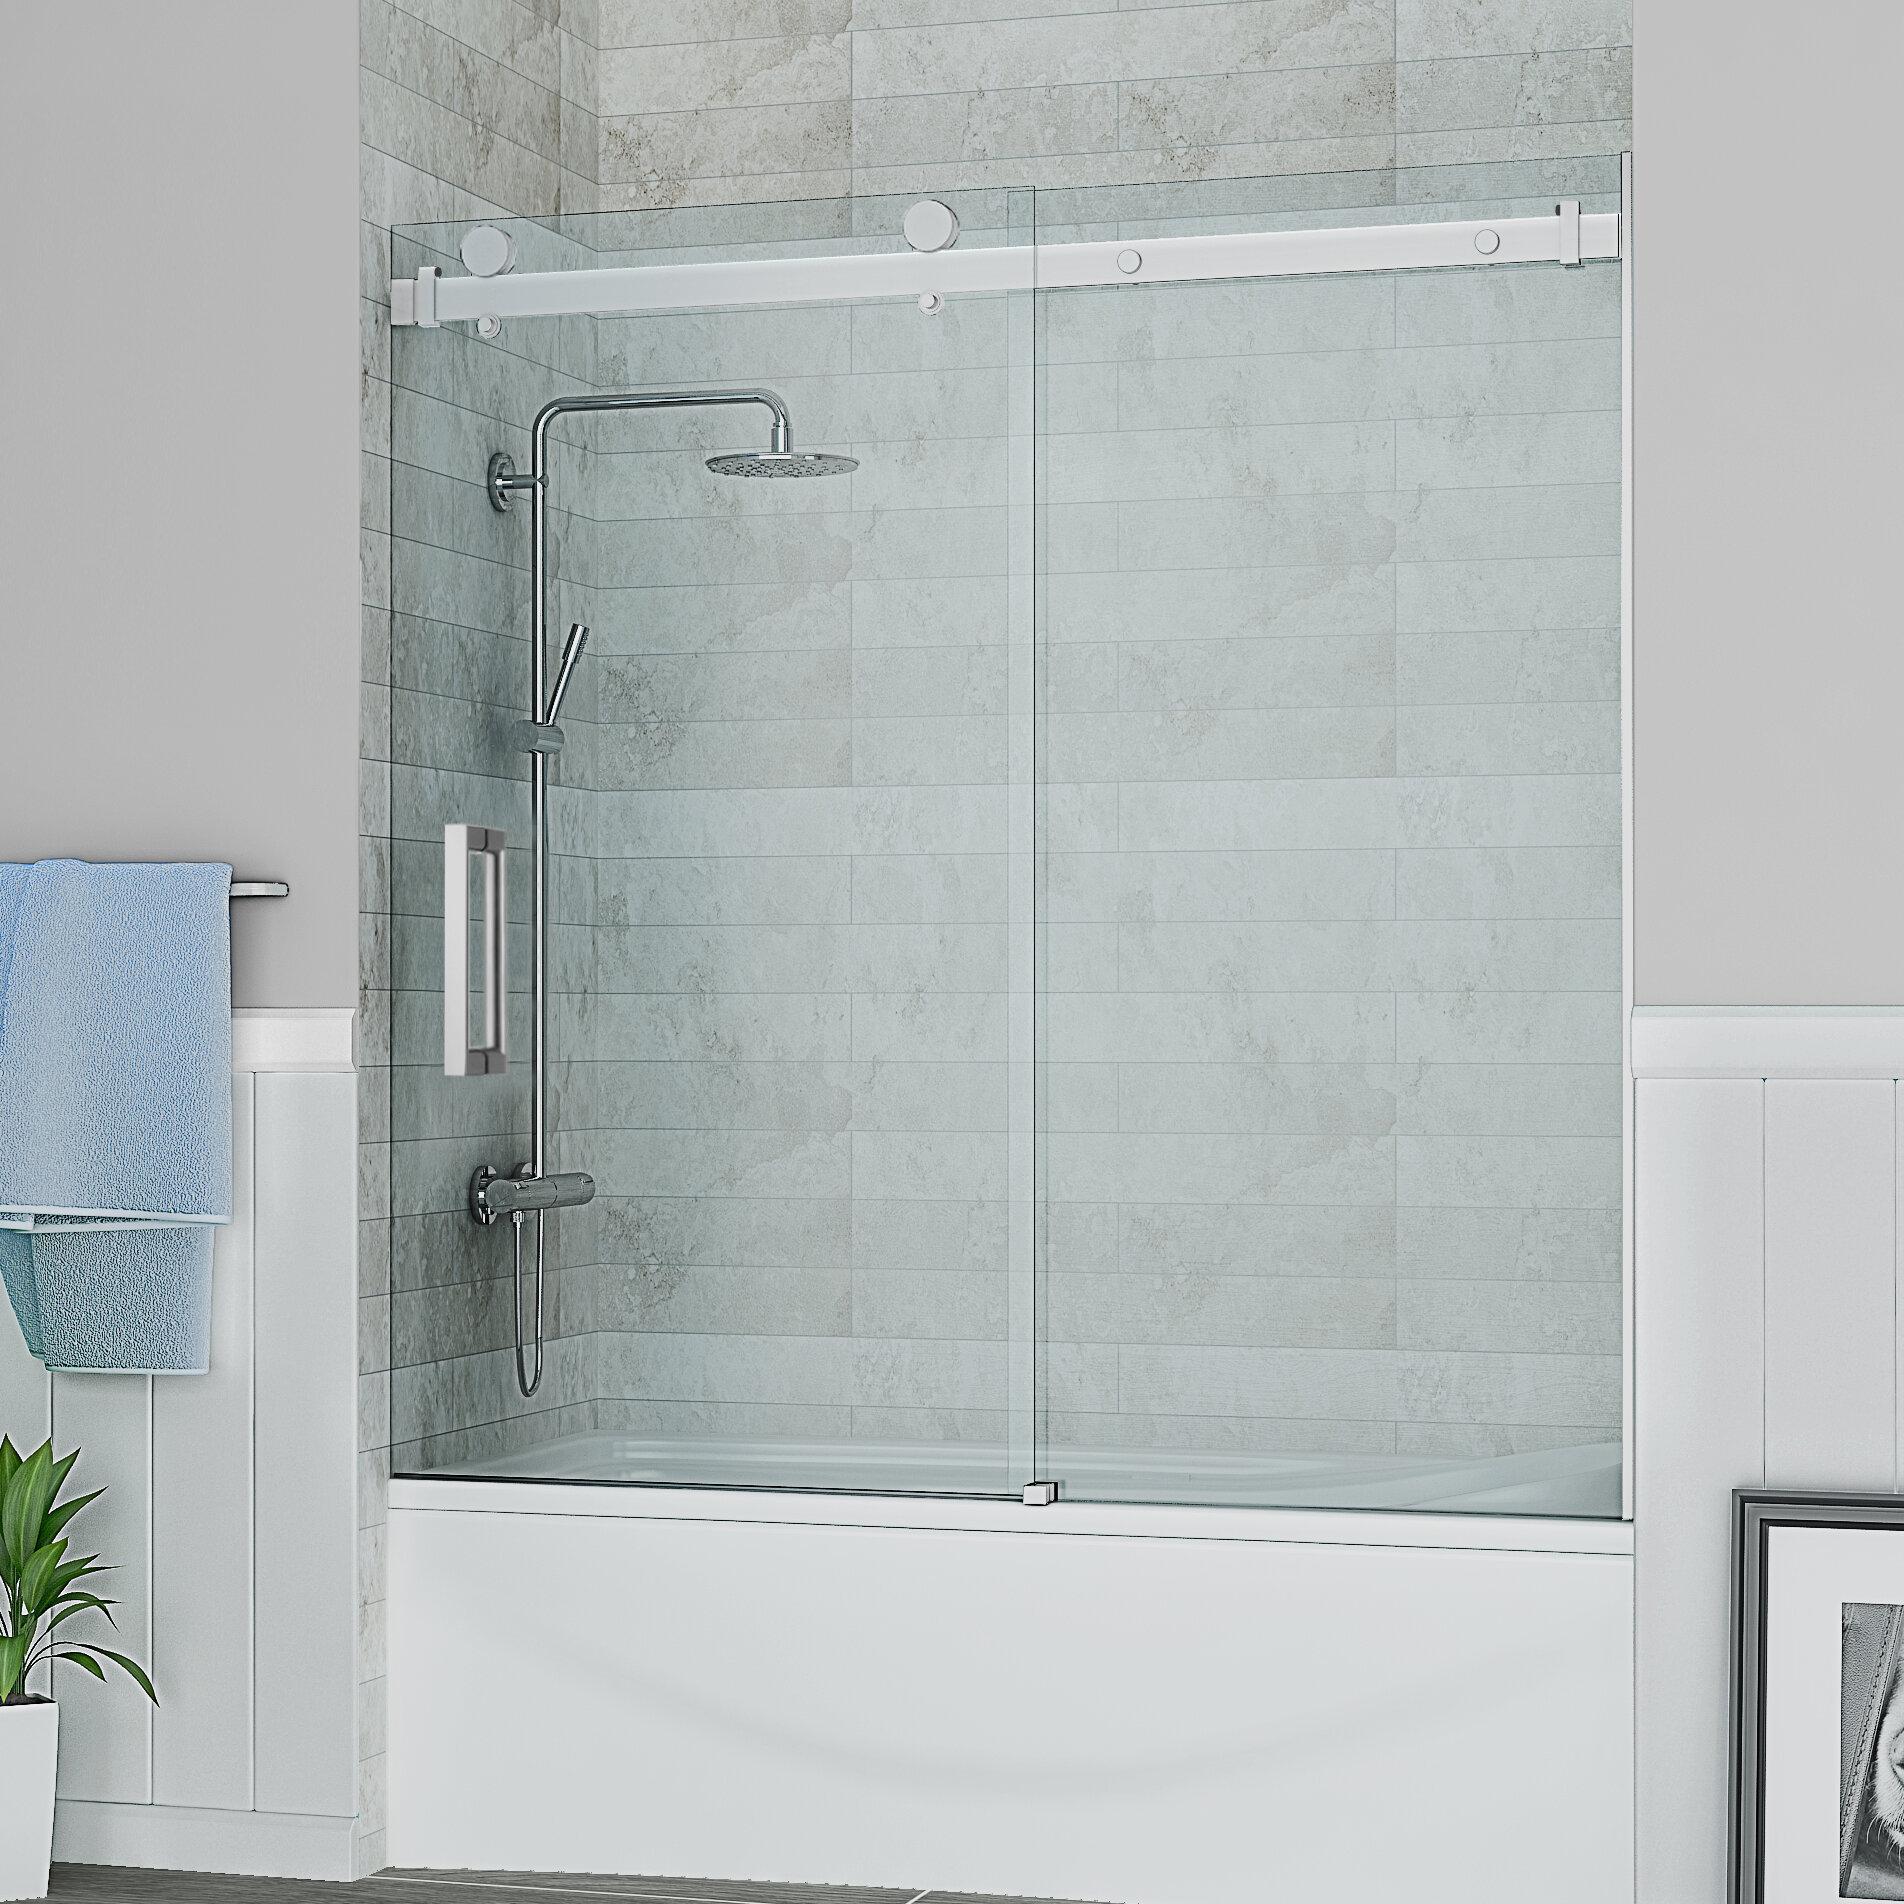 Ove Decors Sierra 59 X 59 Single Sliding Tub Door Reviews Wayfair